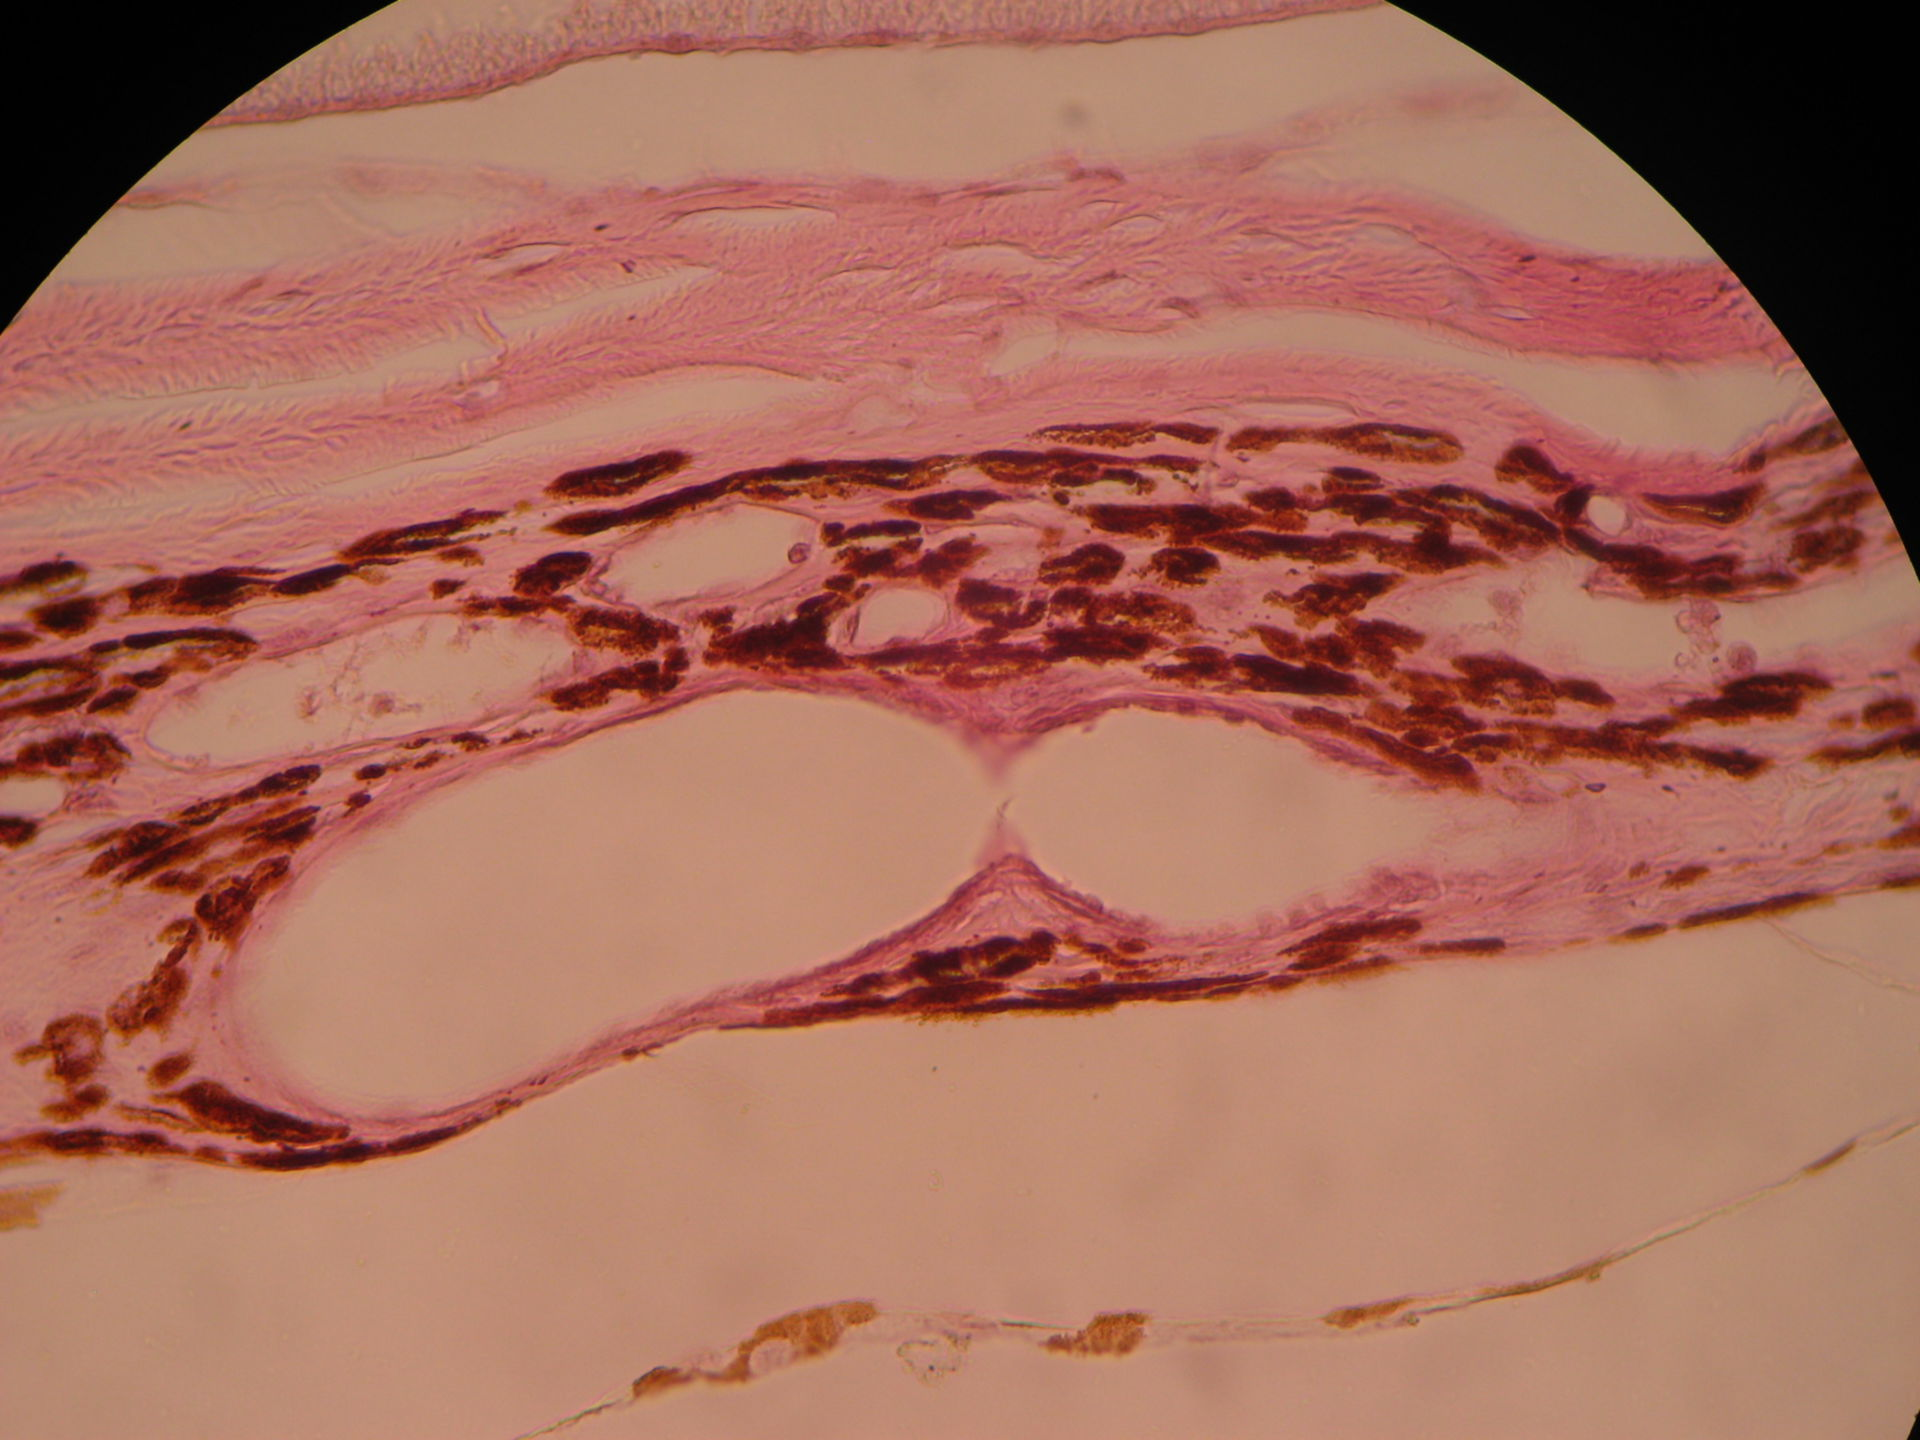 Eye of the sheep - vascular layer